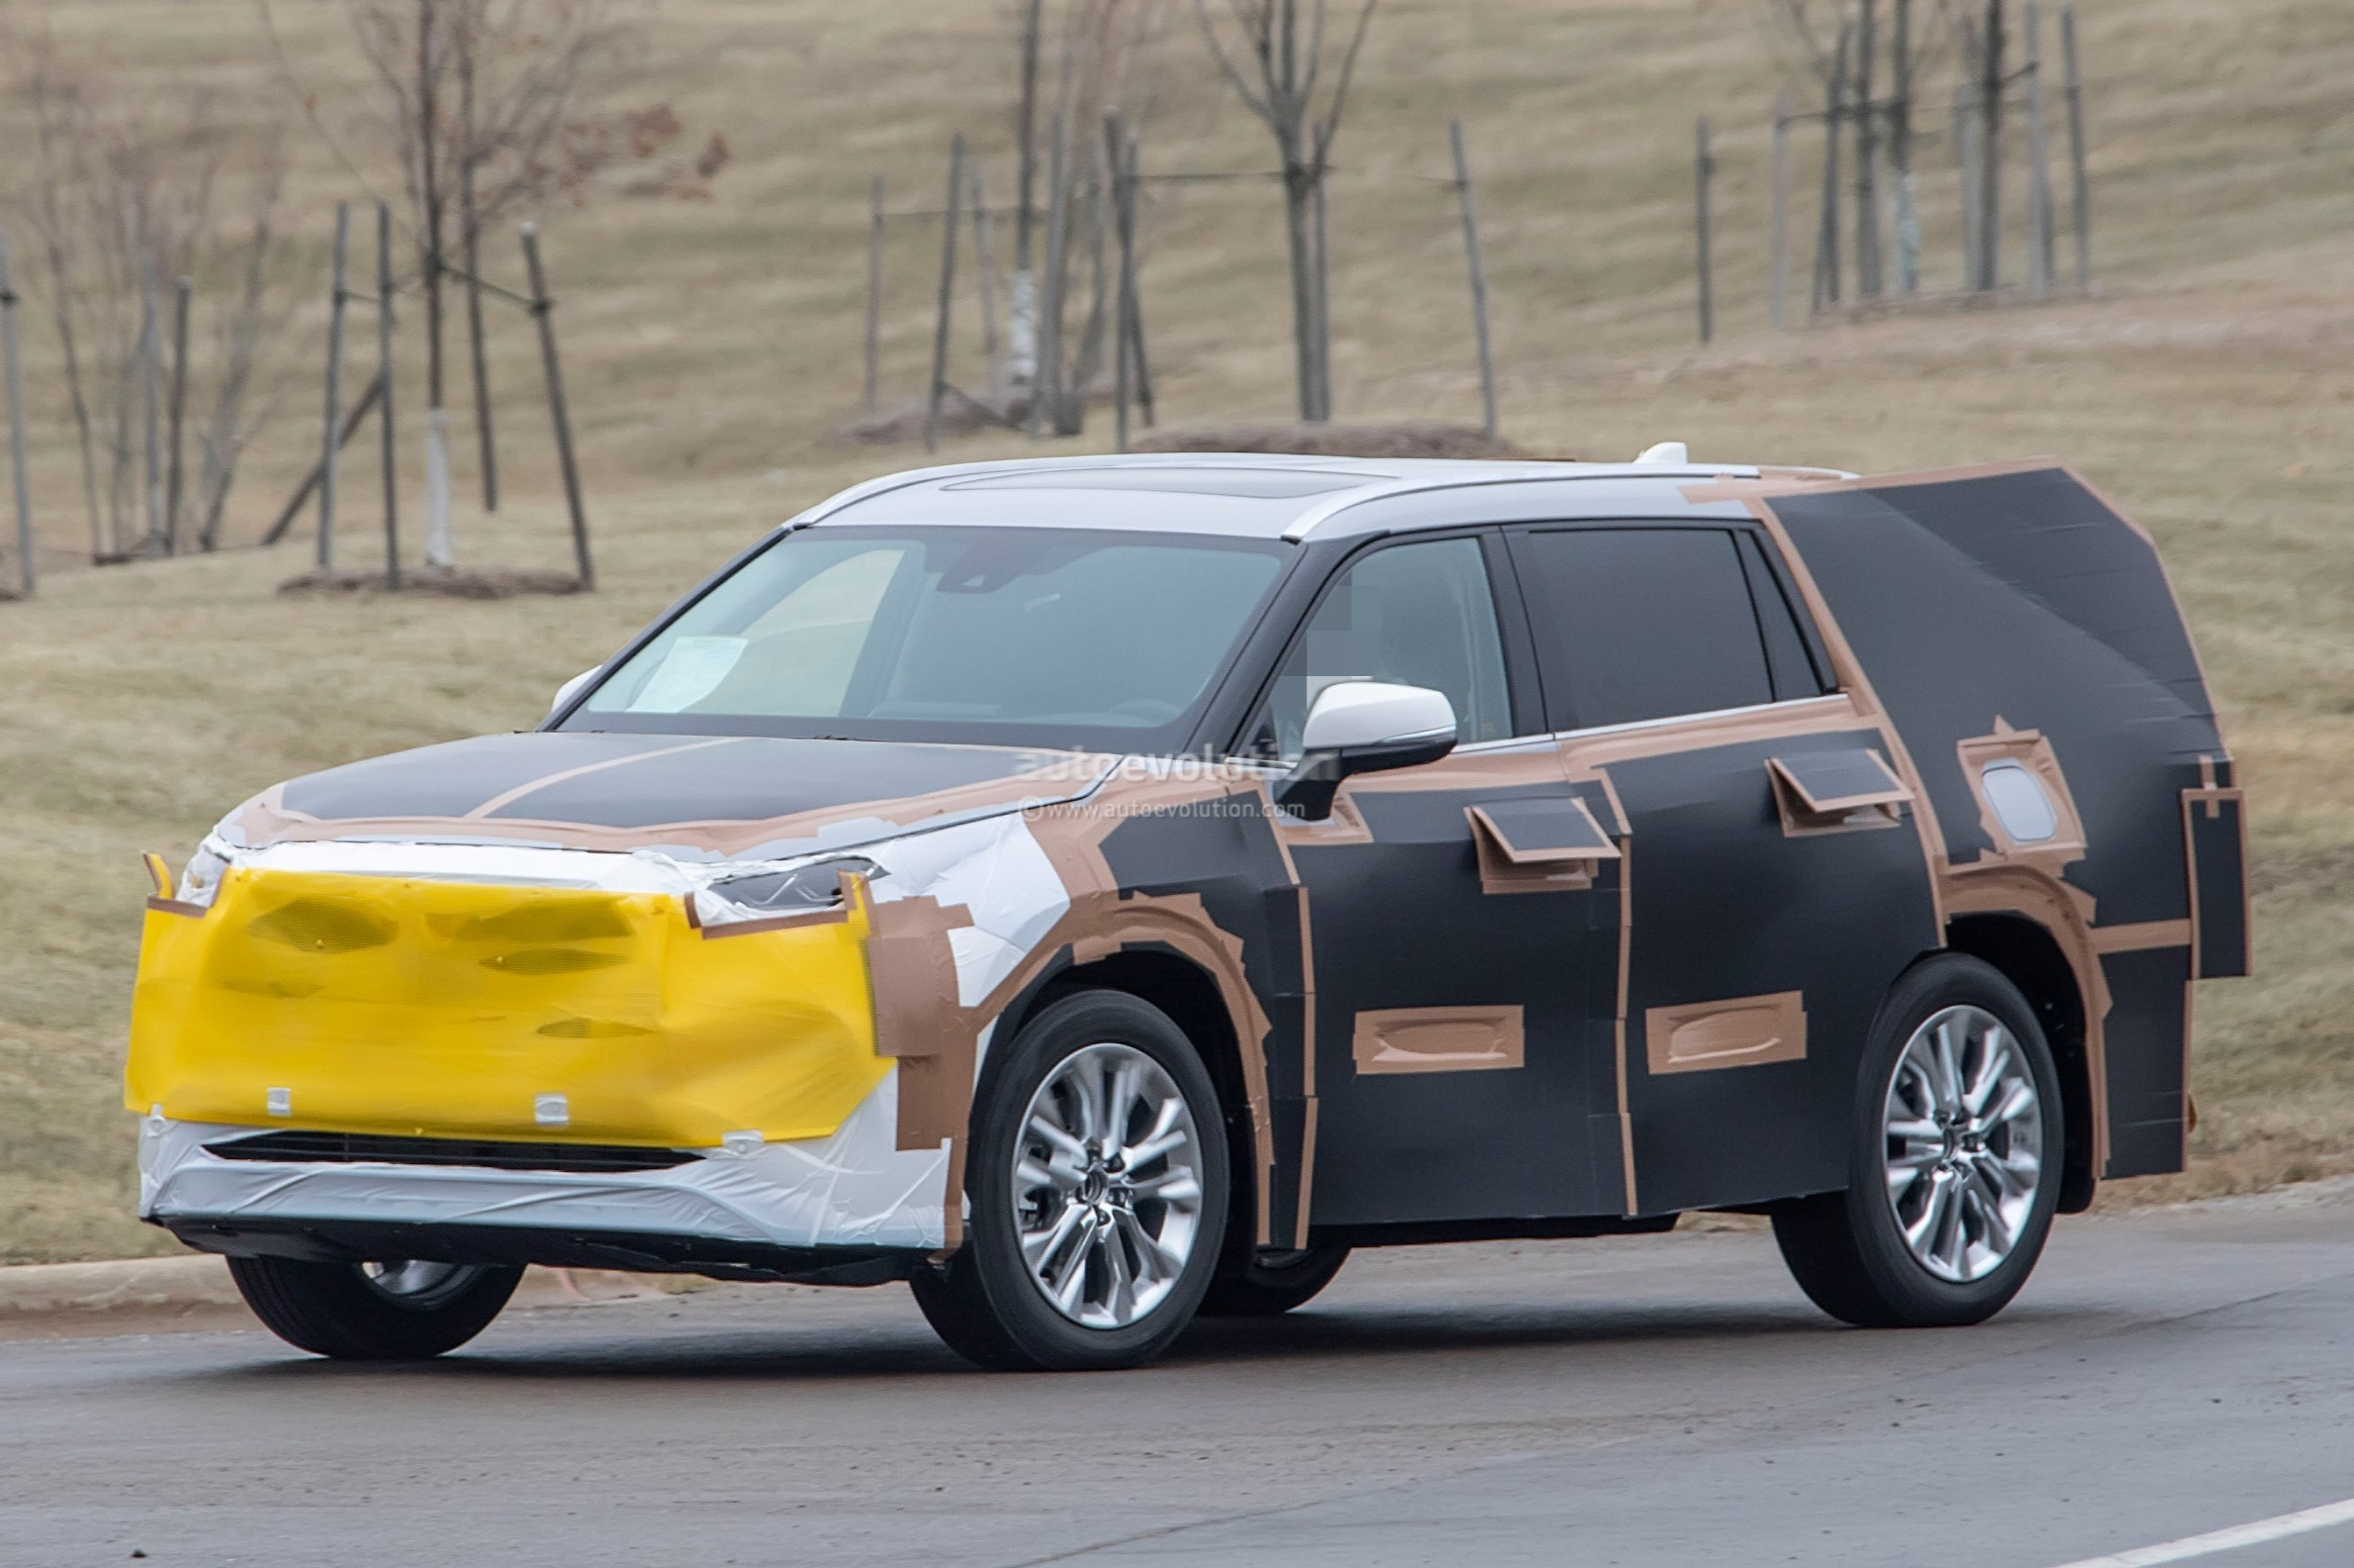 Rav4 Hybrid Reviews >> 2020 Toyota Highlander Spied, Features RAV4-inspired Front Grille - autoevolution